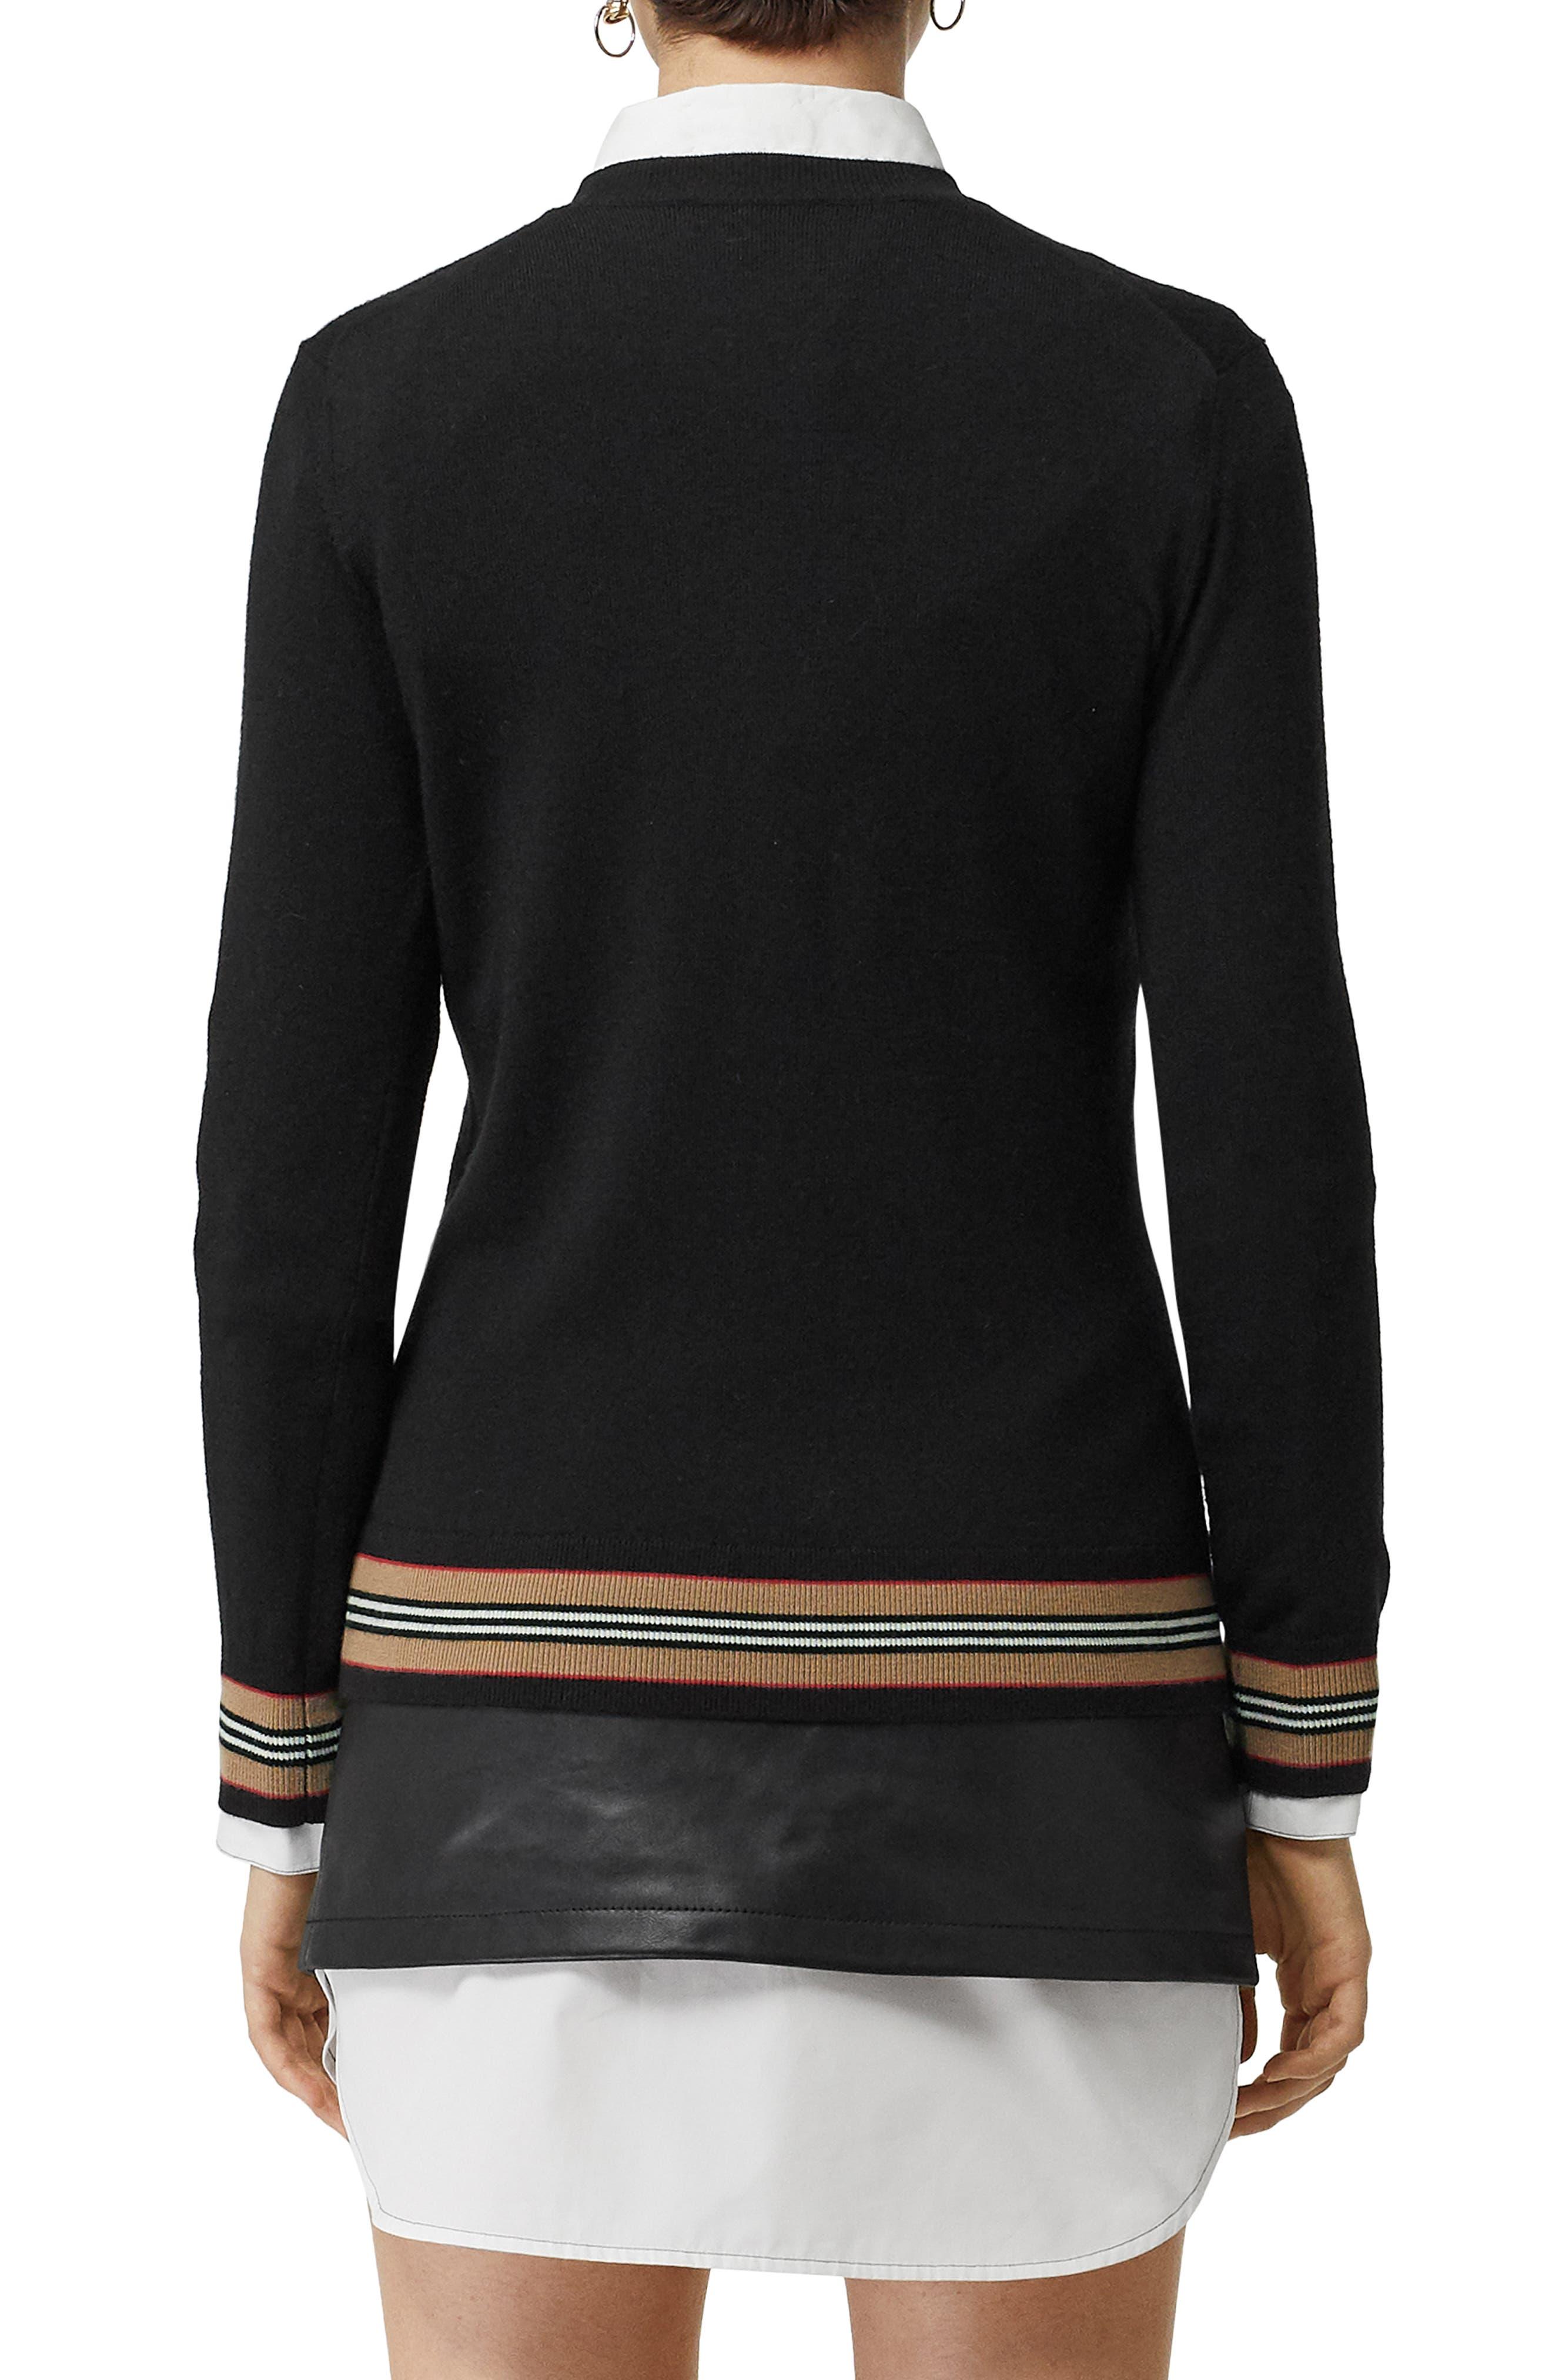 BURBERRY, Stripe Trim Merino Wool Sweater, Alternate thumbnail 2, color, BLACK